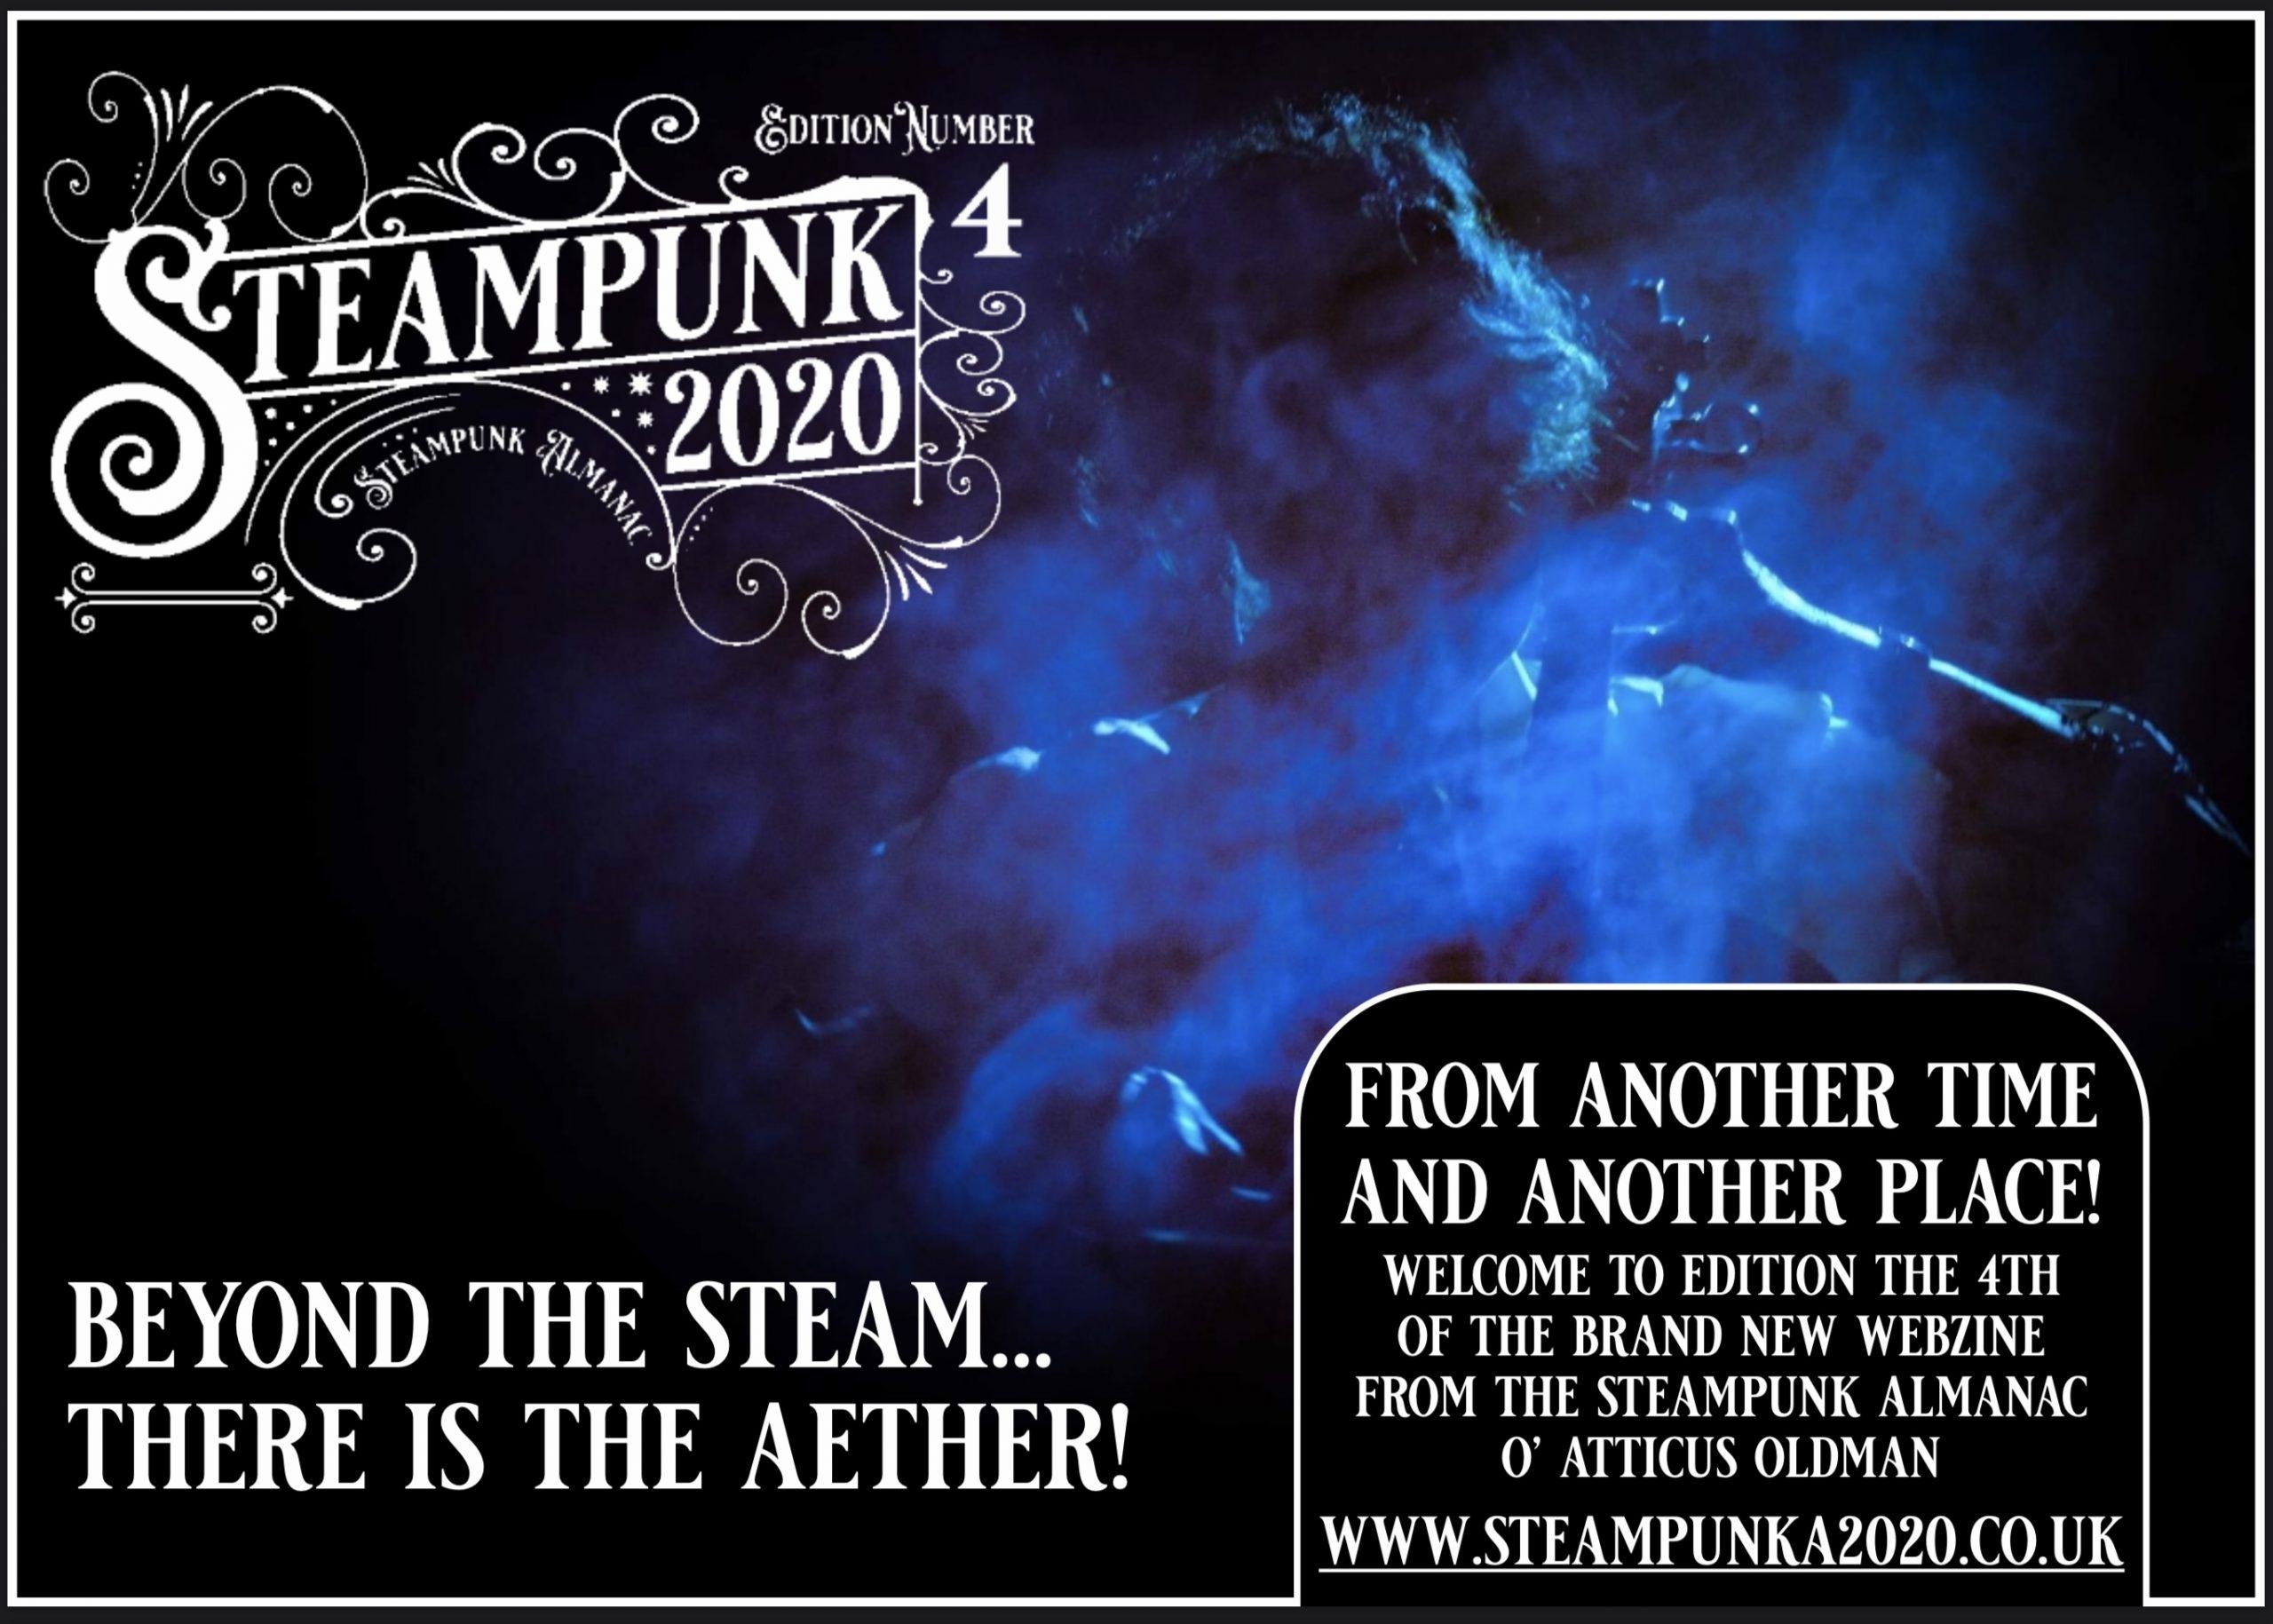 Steampunk Webzine Cover 4